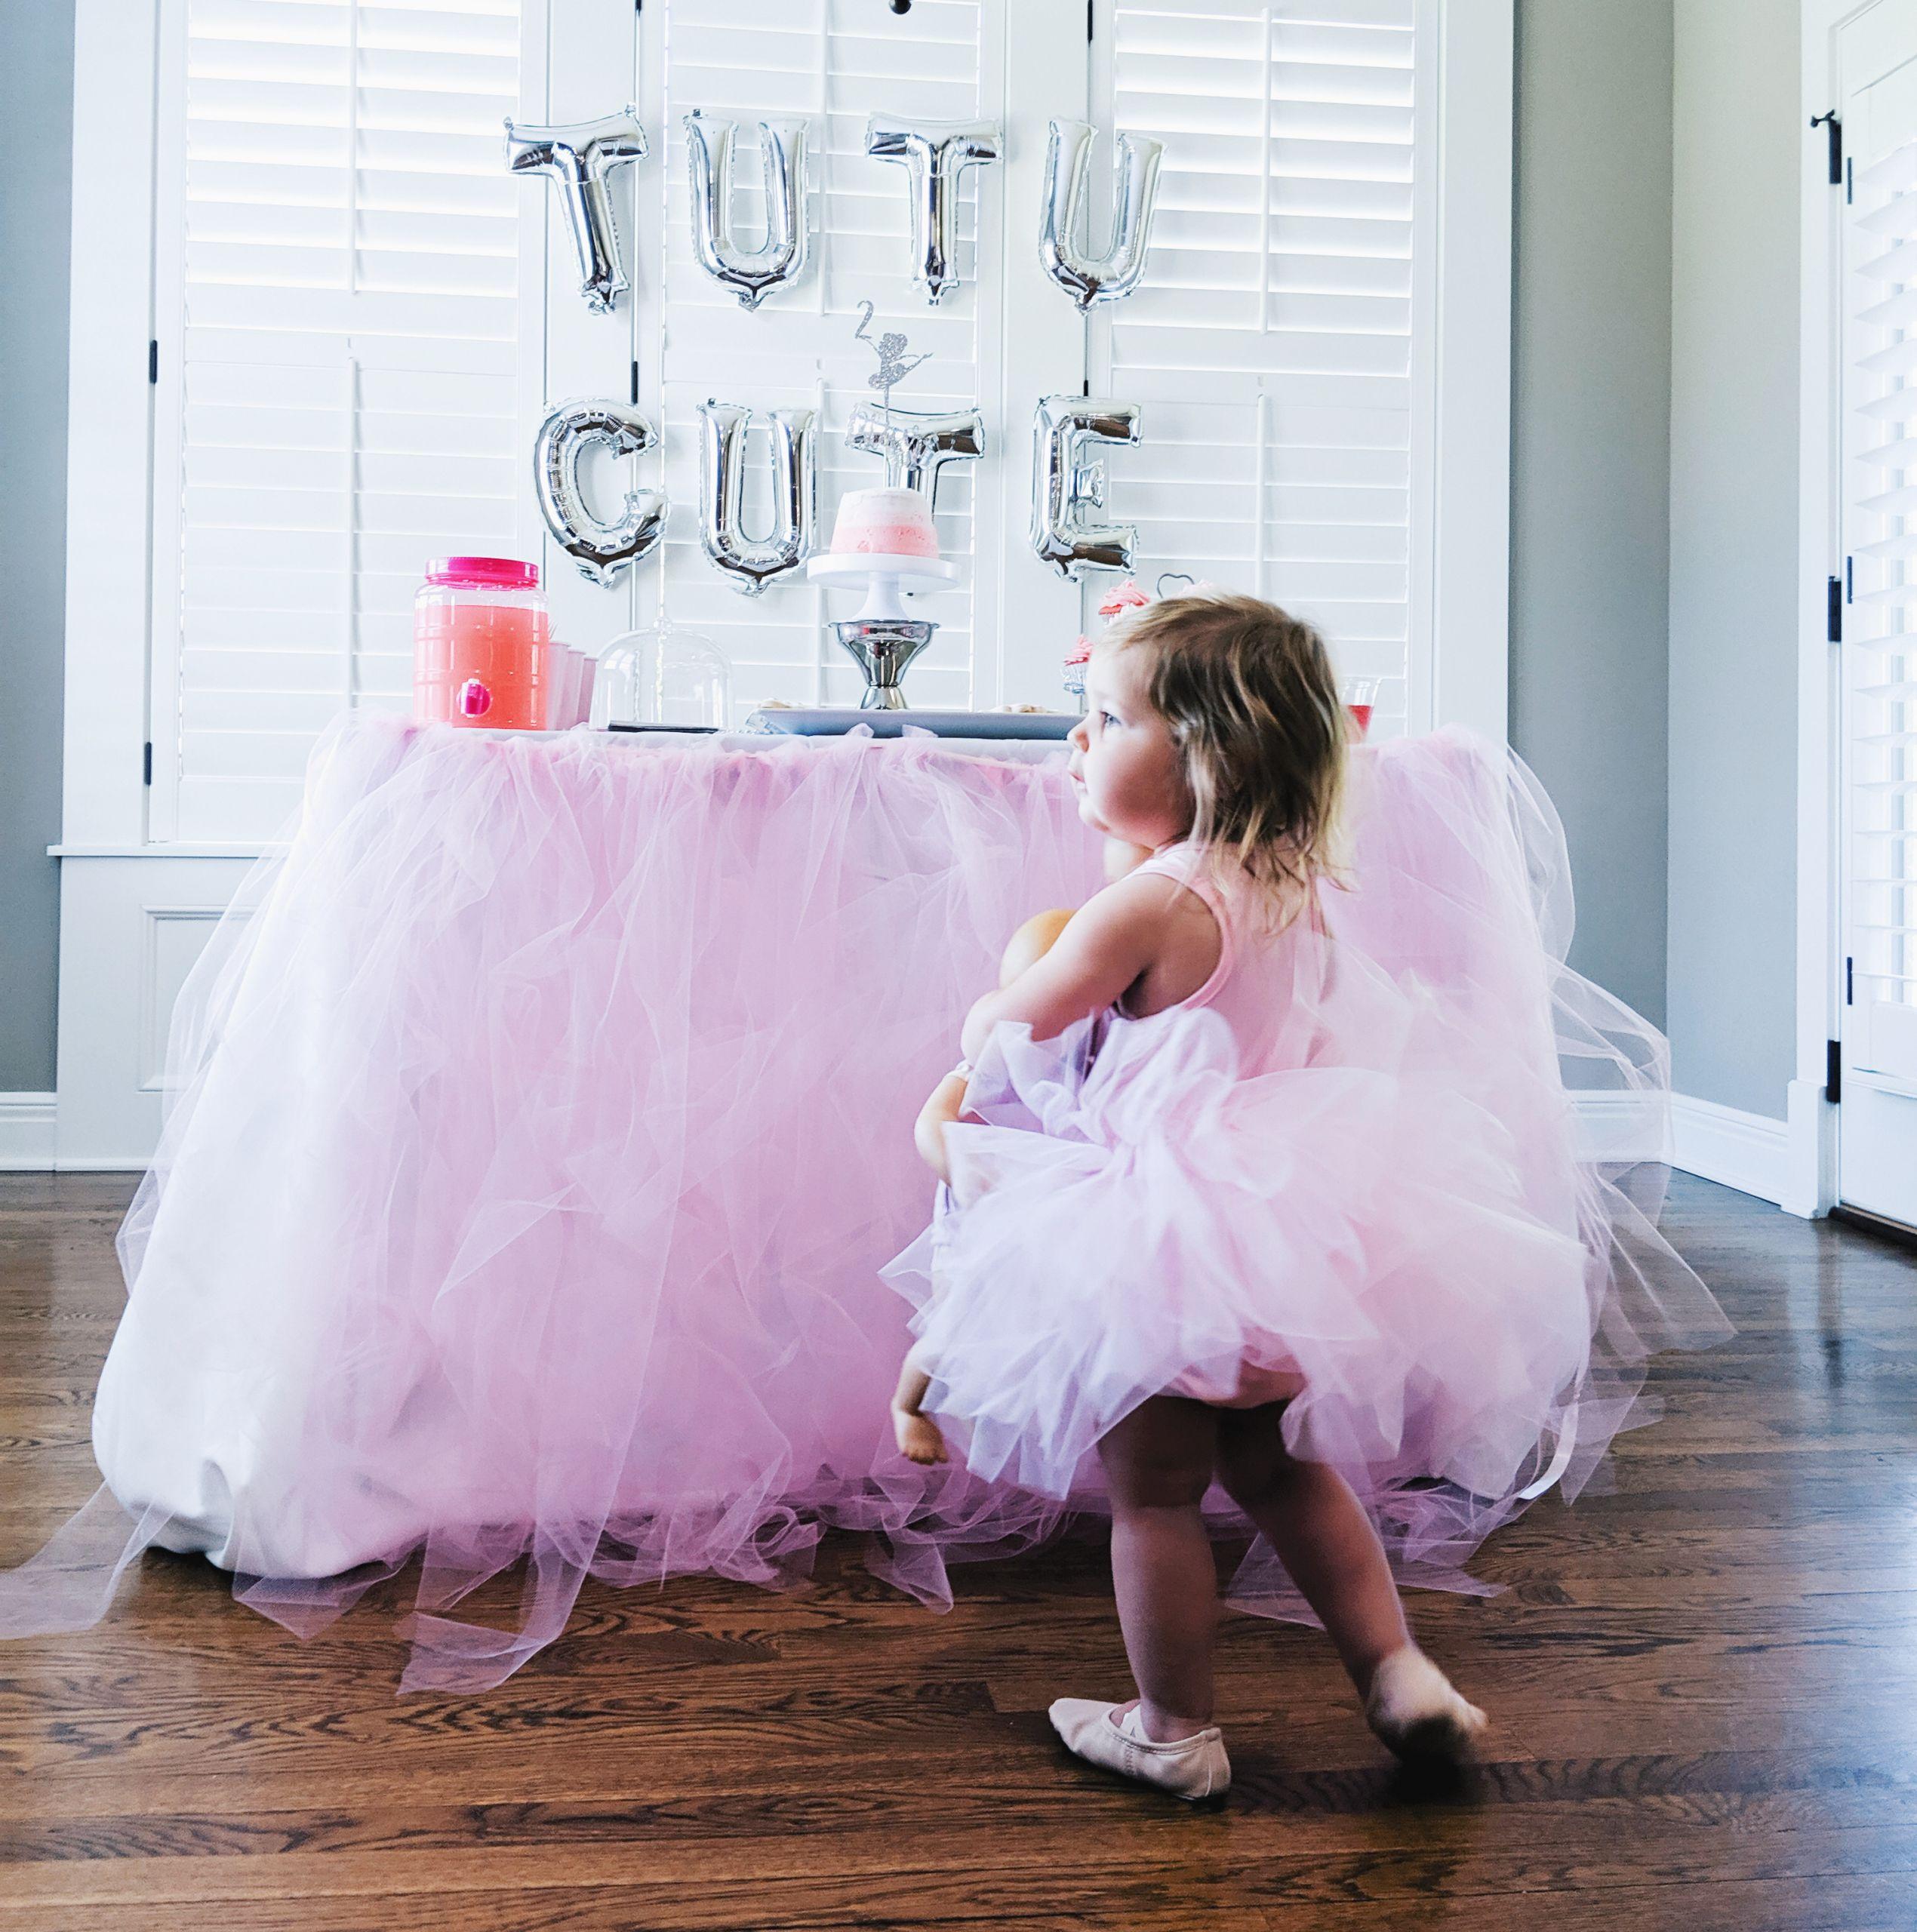 Birthday Party Ideas For 2 Year Girl  Tutu Cute Birthday Party 2nd Birthday Party Ideas